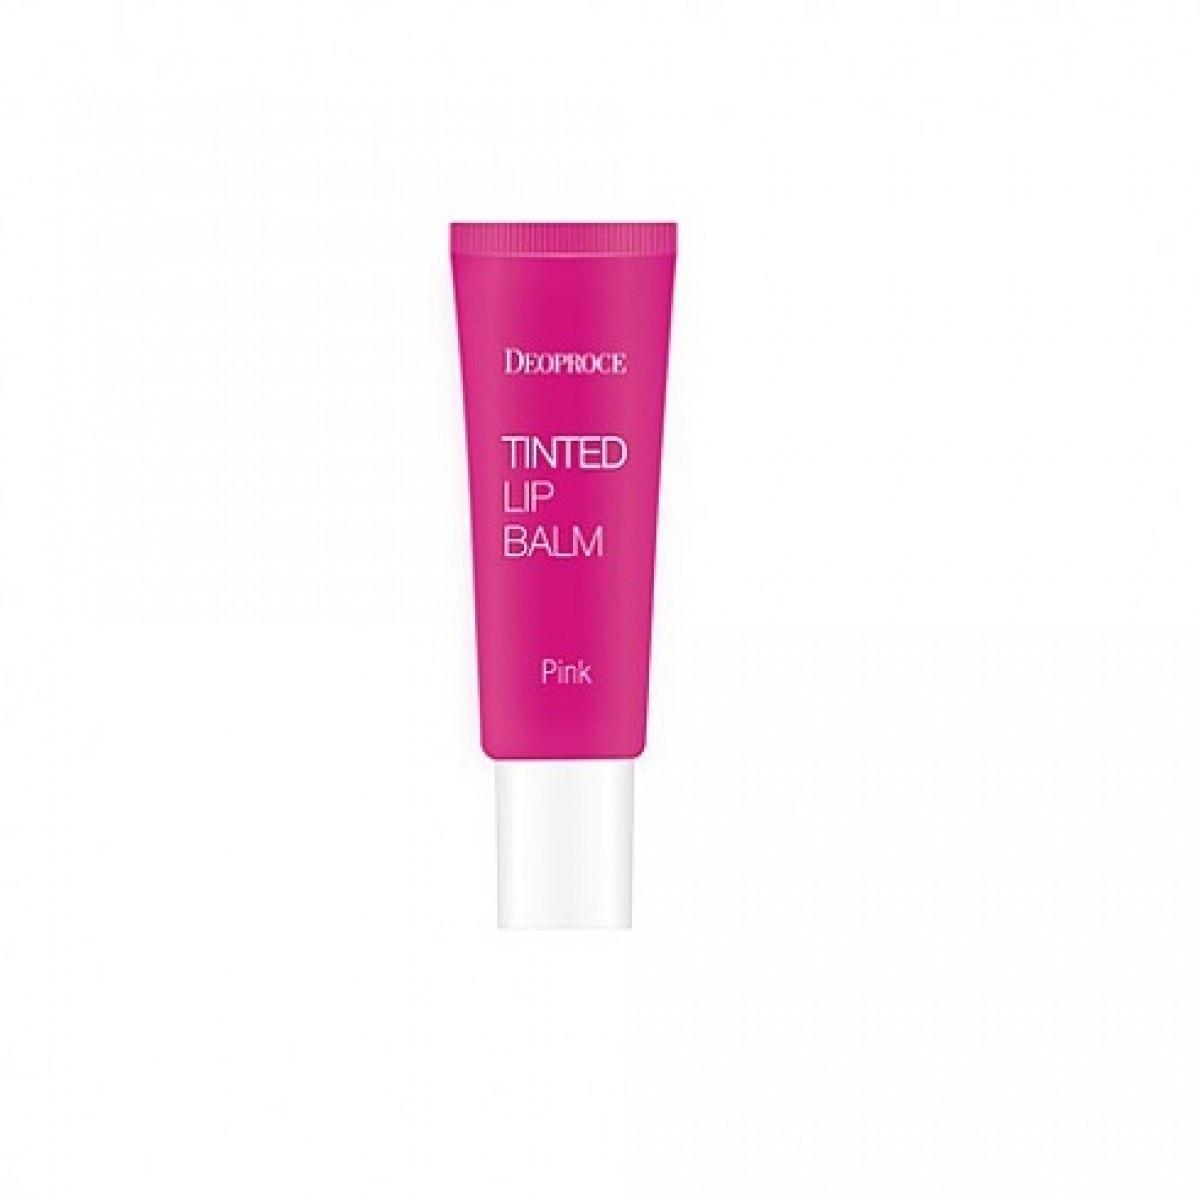 Бальзам для губ Deoproce Tinted Lip Balm 10g. Pink